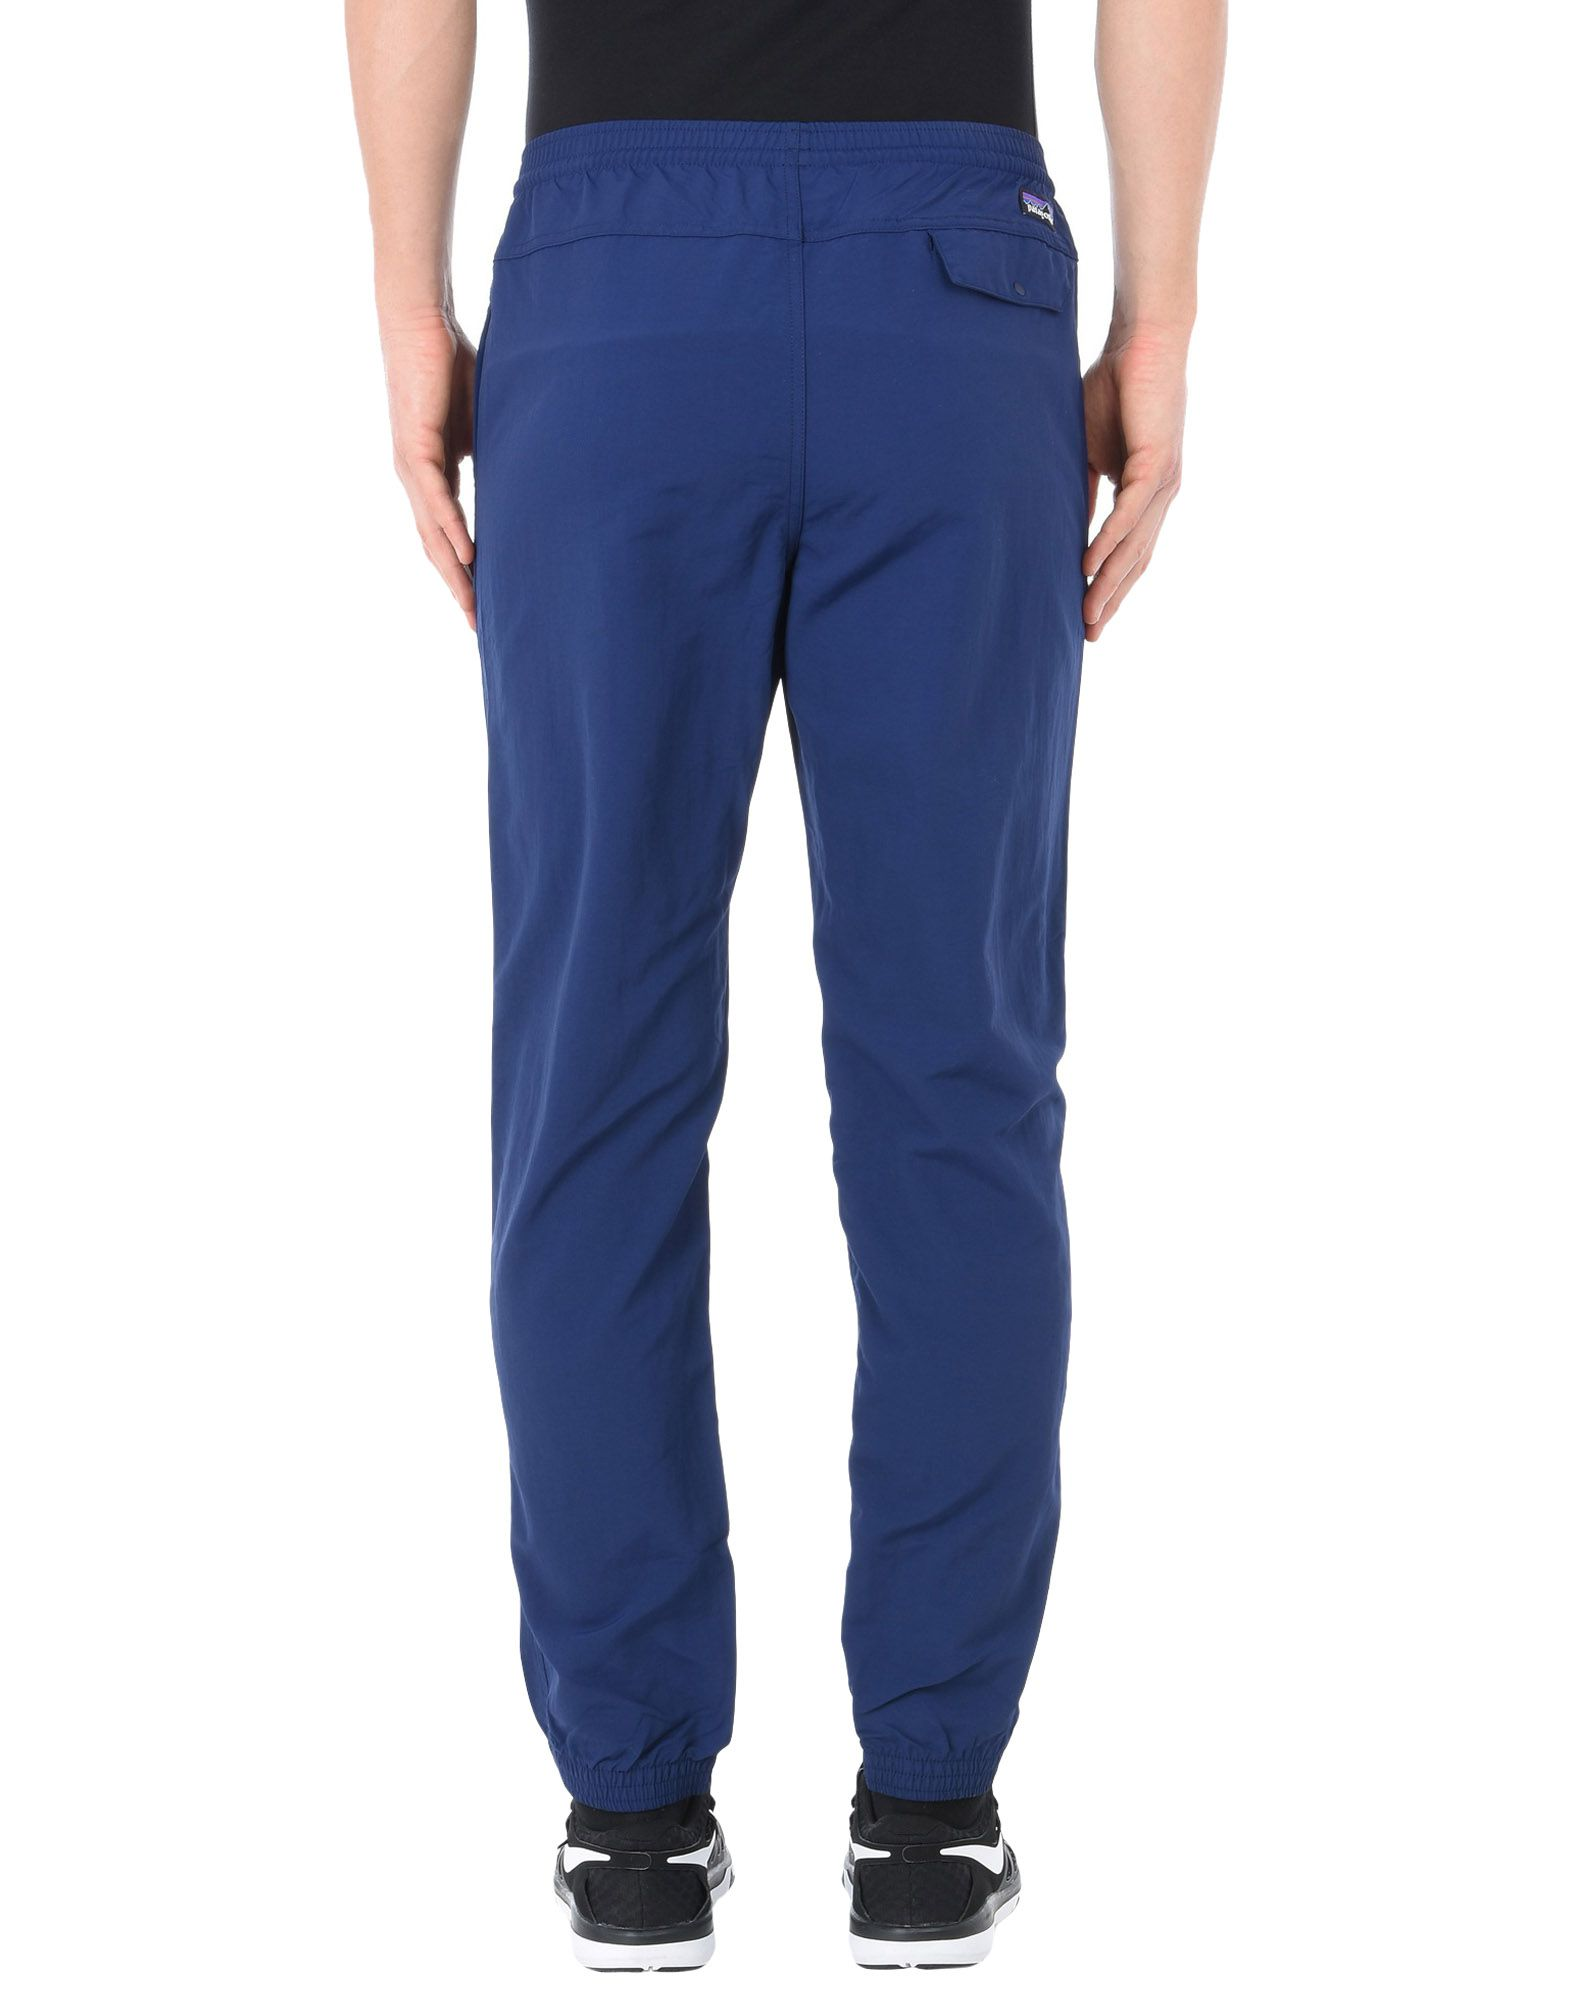 Pantalone Patagonia M's Borsagies Pants - Reg - Uomo Uomo - - 13175123SQ 6f5317